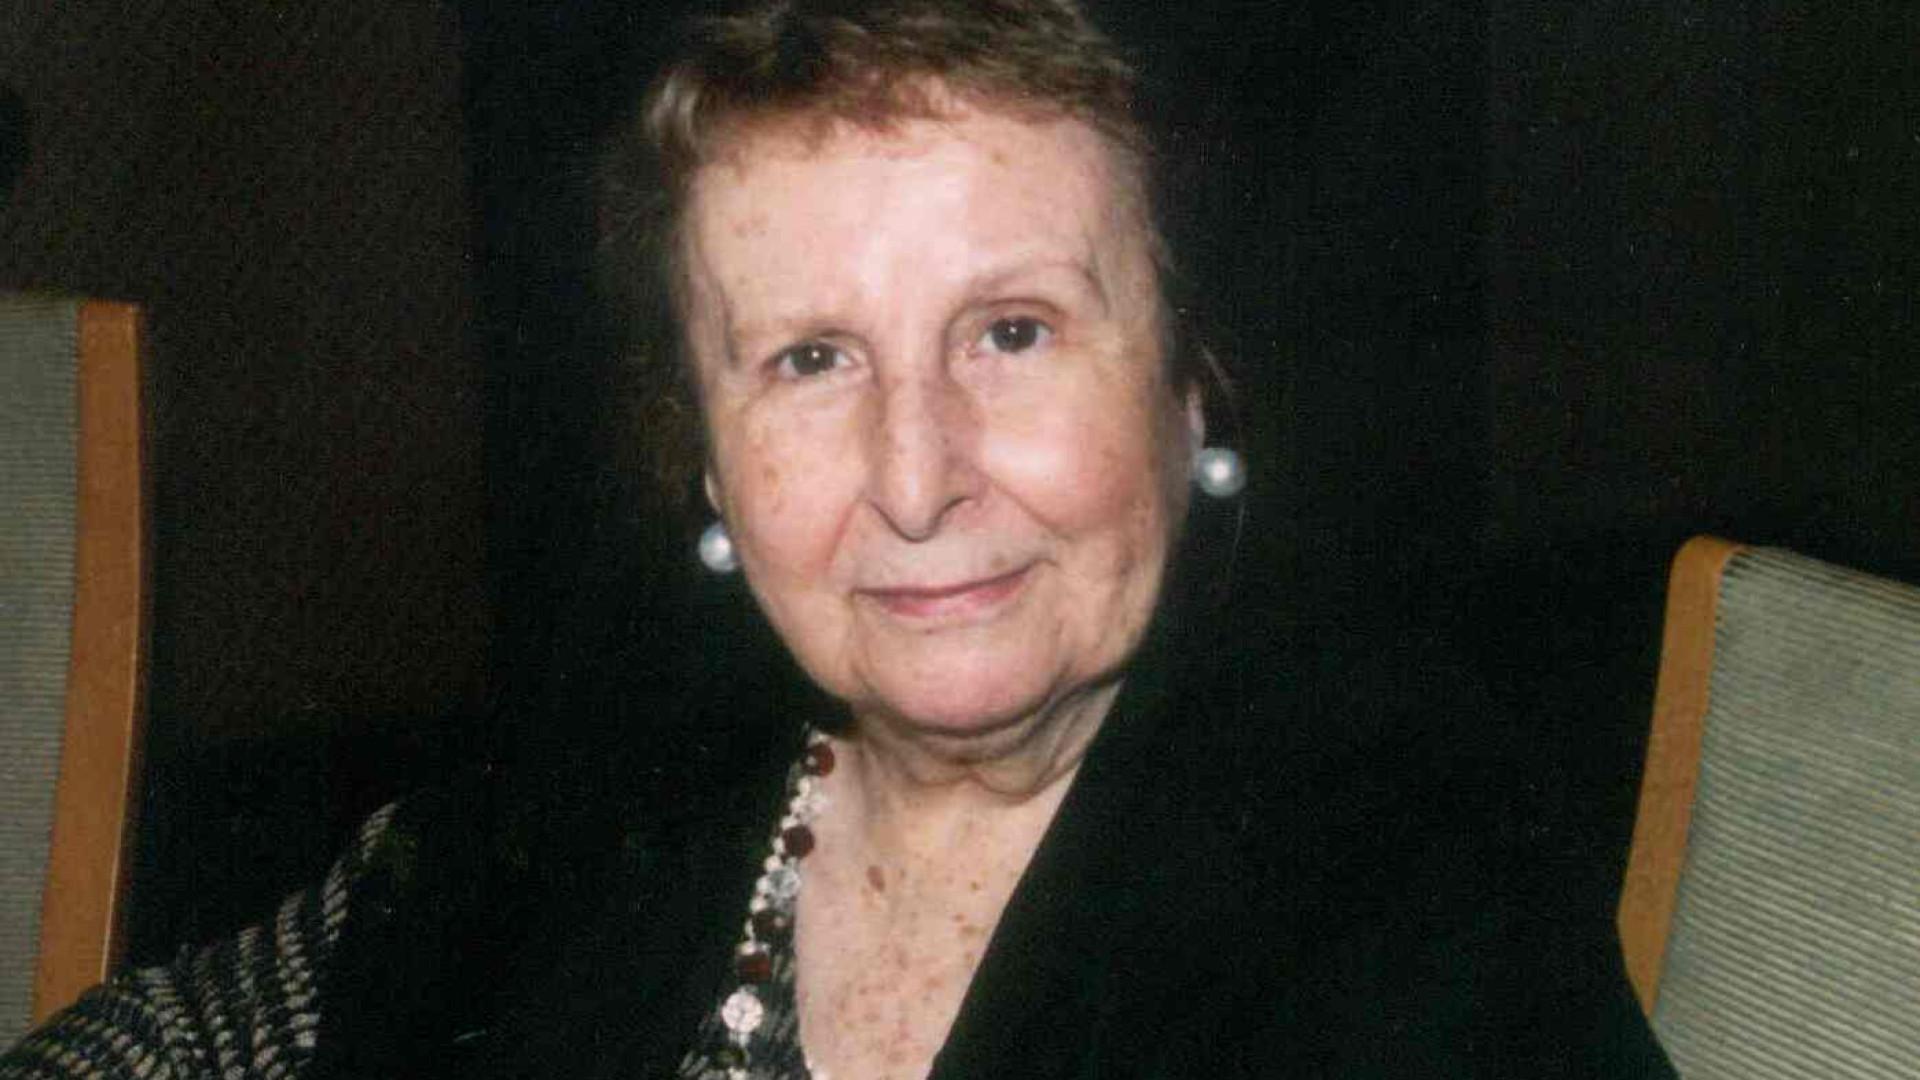 Morreu Agustina Bessa-Luís. Tinha 96 anos